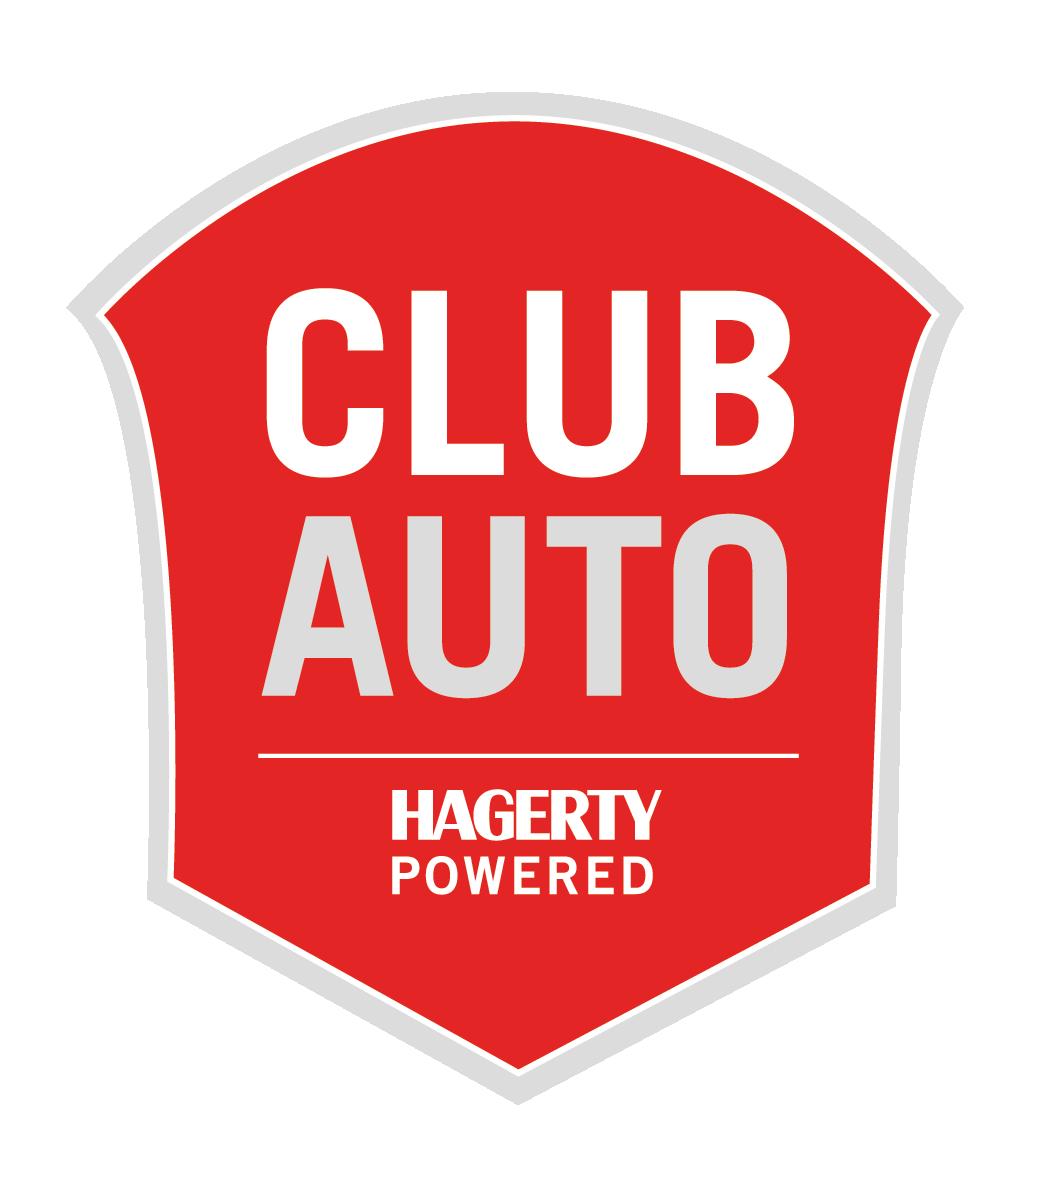 Club_Auto_2C_Red_Grey